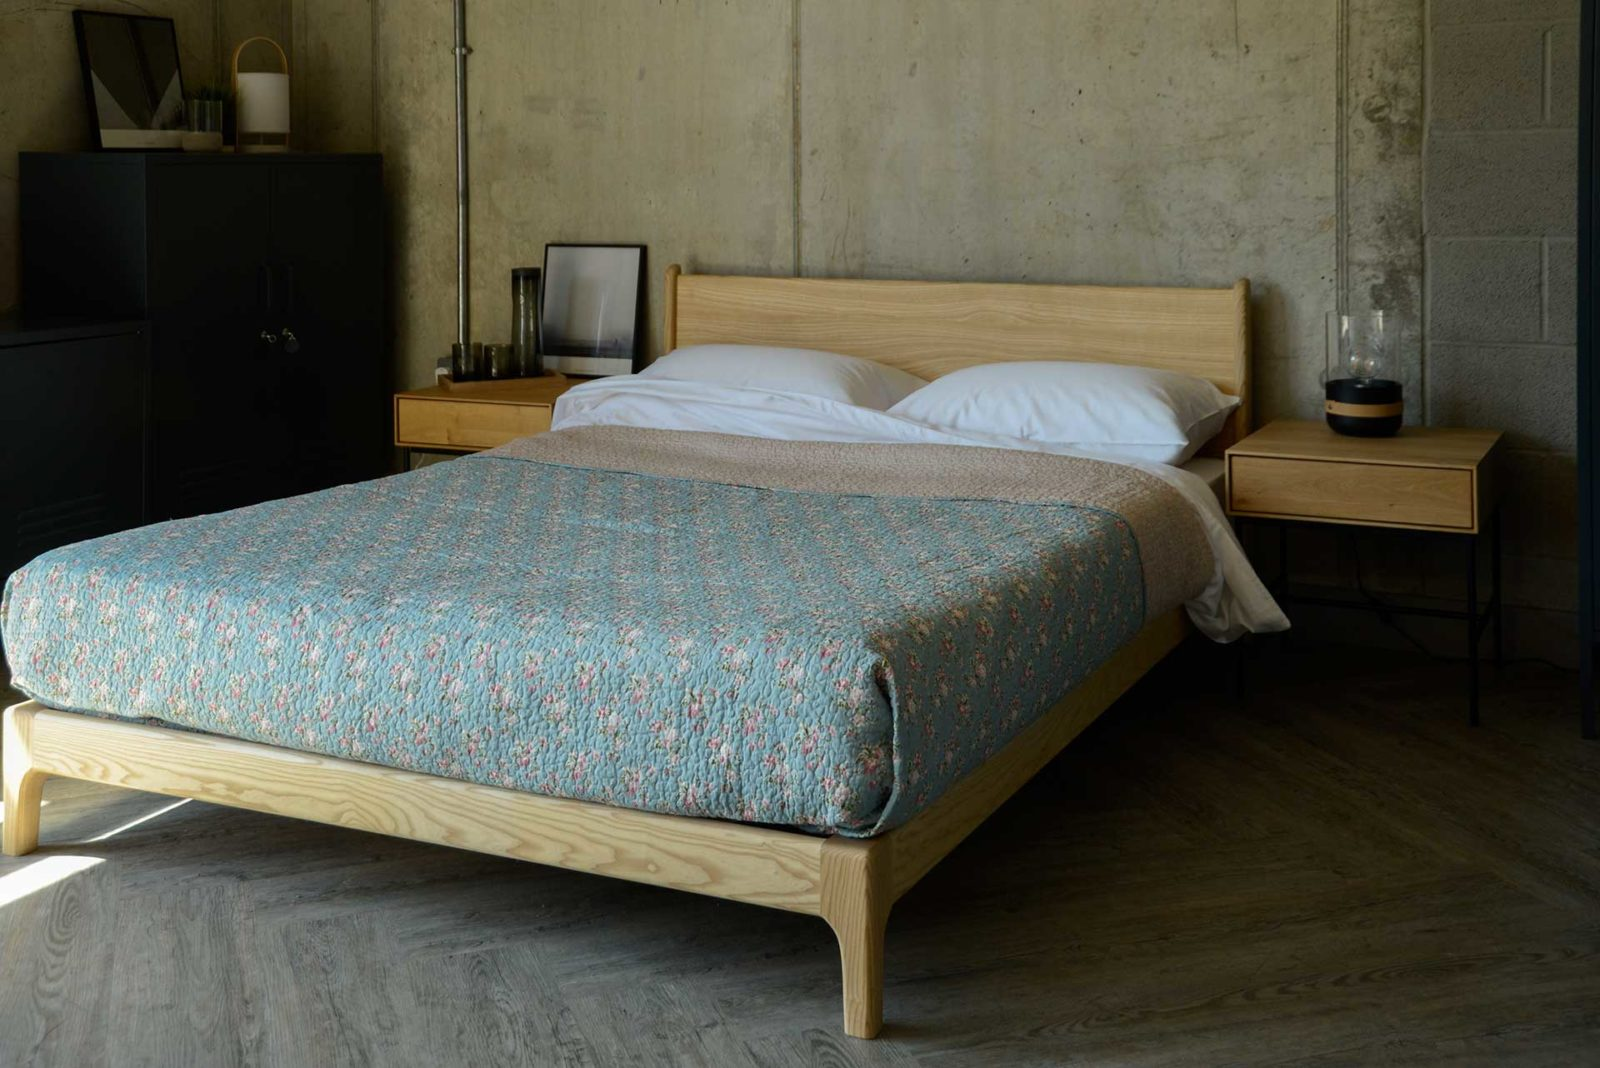 Vintage look pale blue patterned bedspread on solid wood Carnaby bed